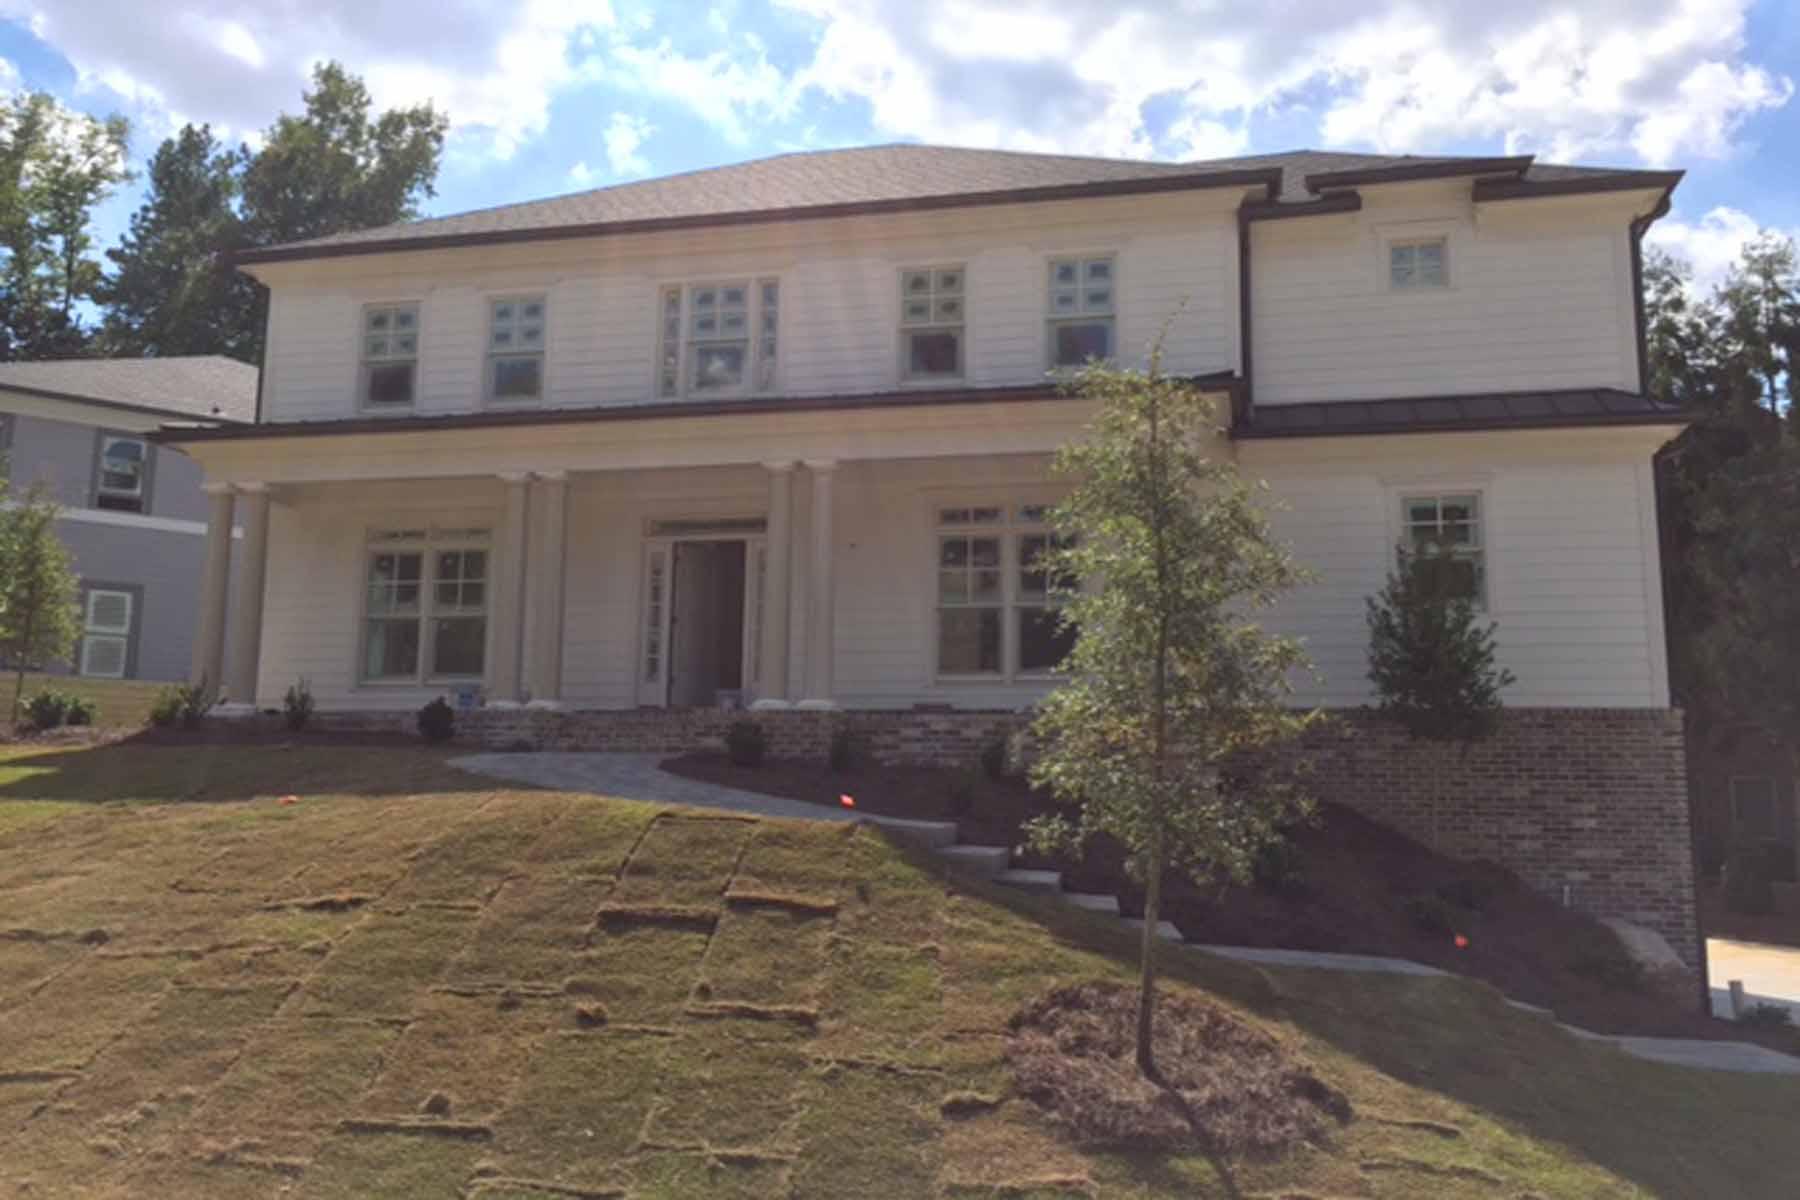 Casa para uma família para Venda às Luxury Cul-de-Sac Home in Sheridan Estates 1175 Sheridan Road NE Lot 1 Atlanta, Geórgia, 30324 Estados Unidos